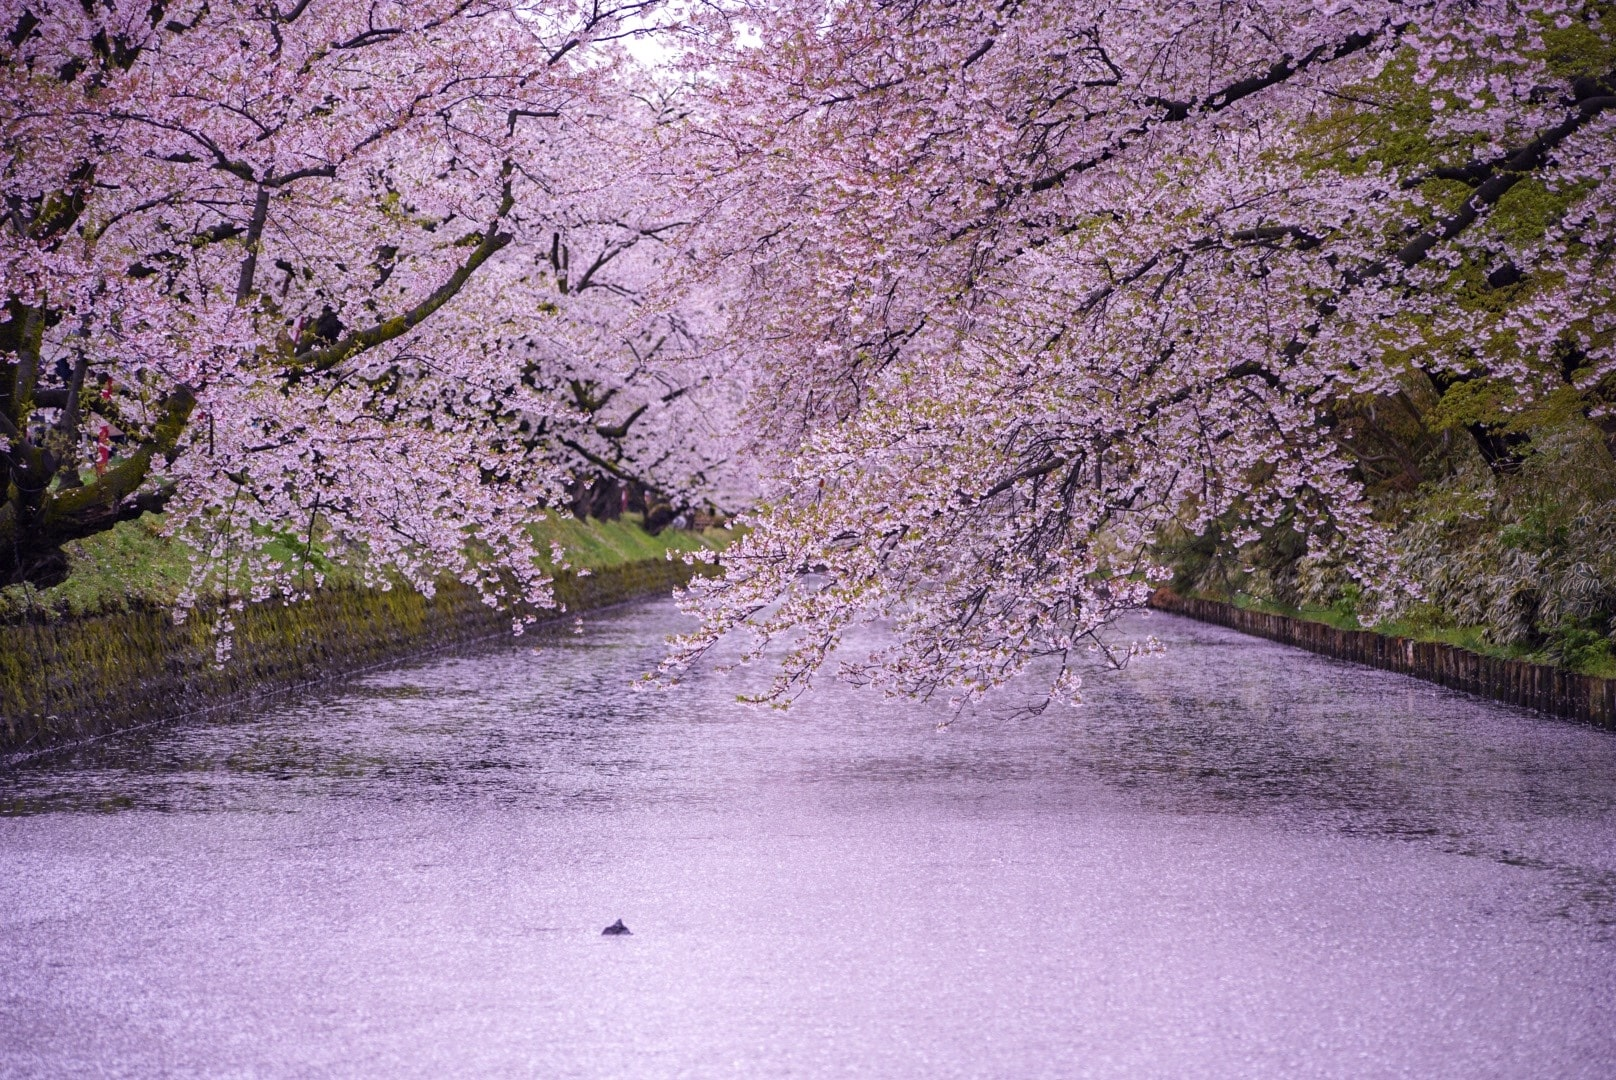 Best Cherry Blossom Spots in Tohoku2020